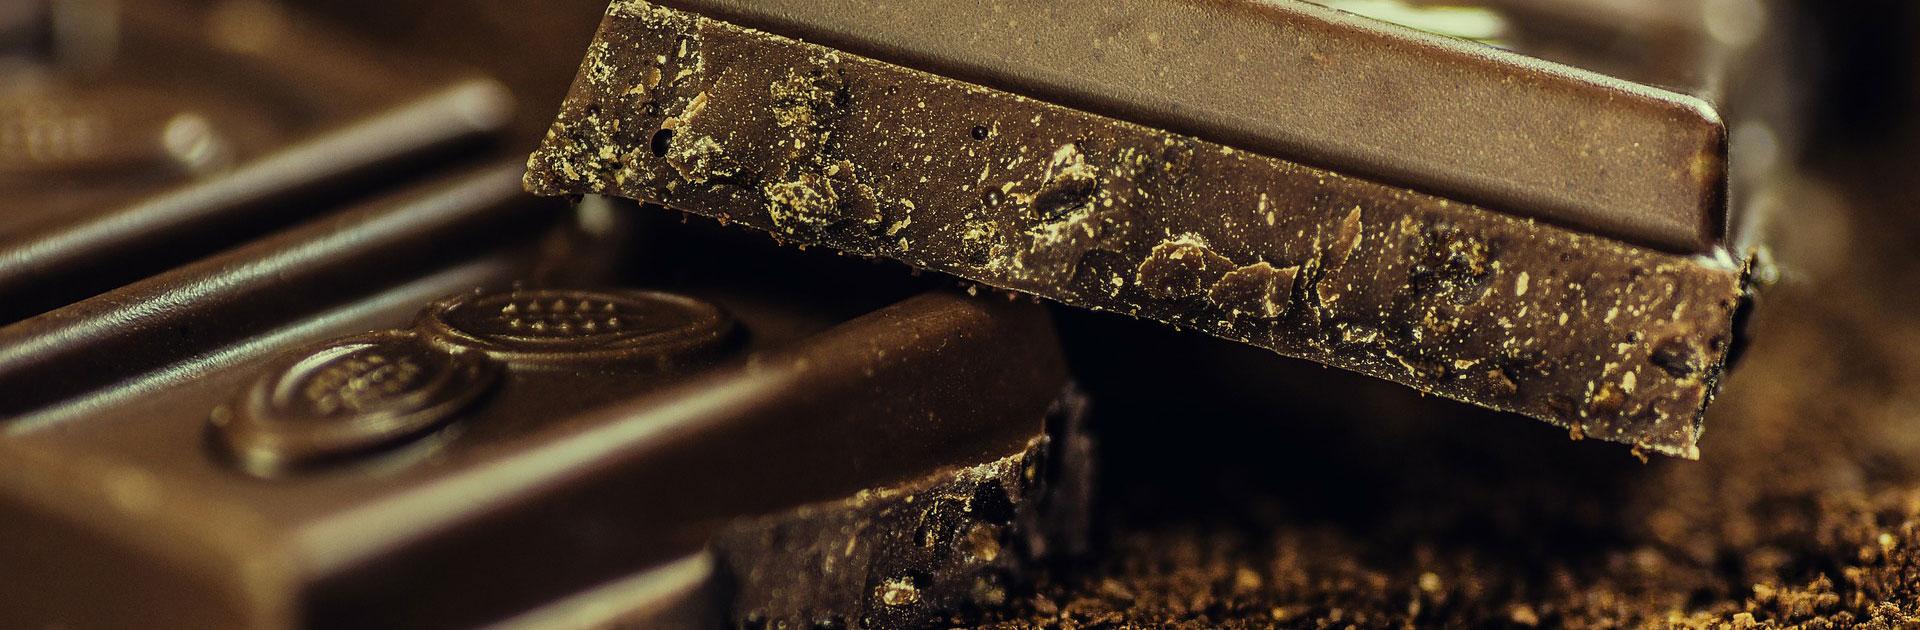 chocolat confiserie fougeres